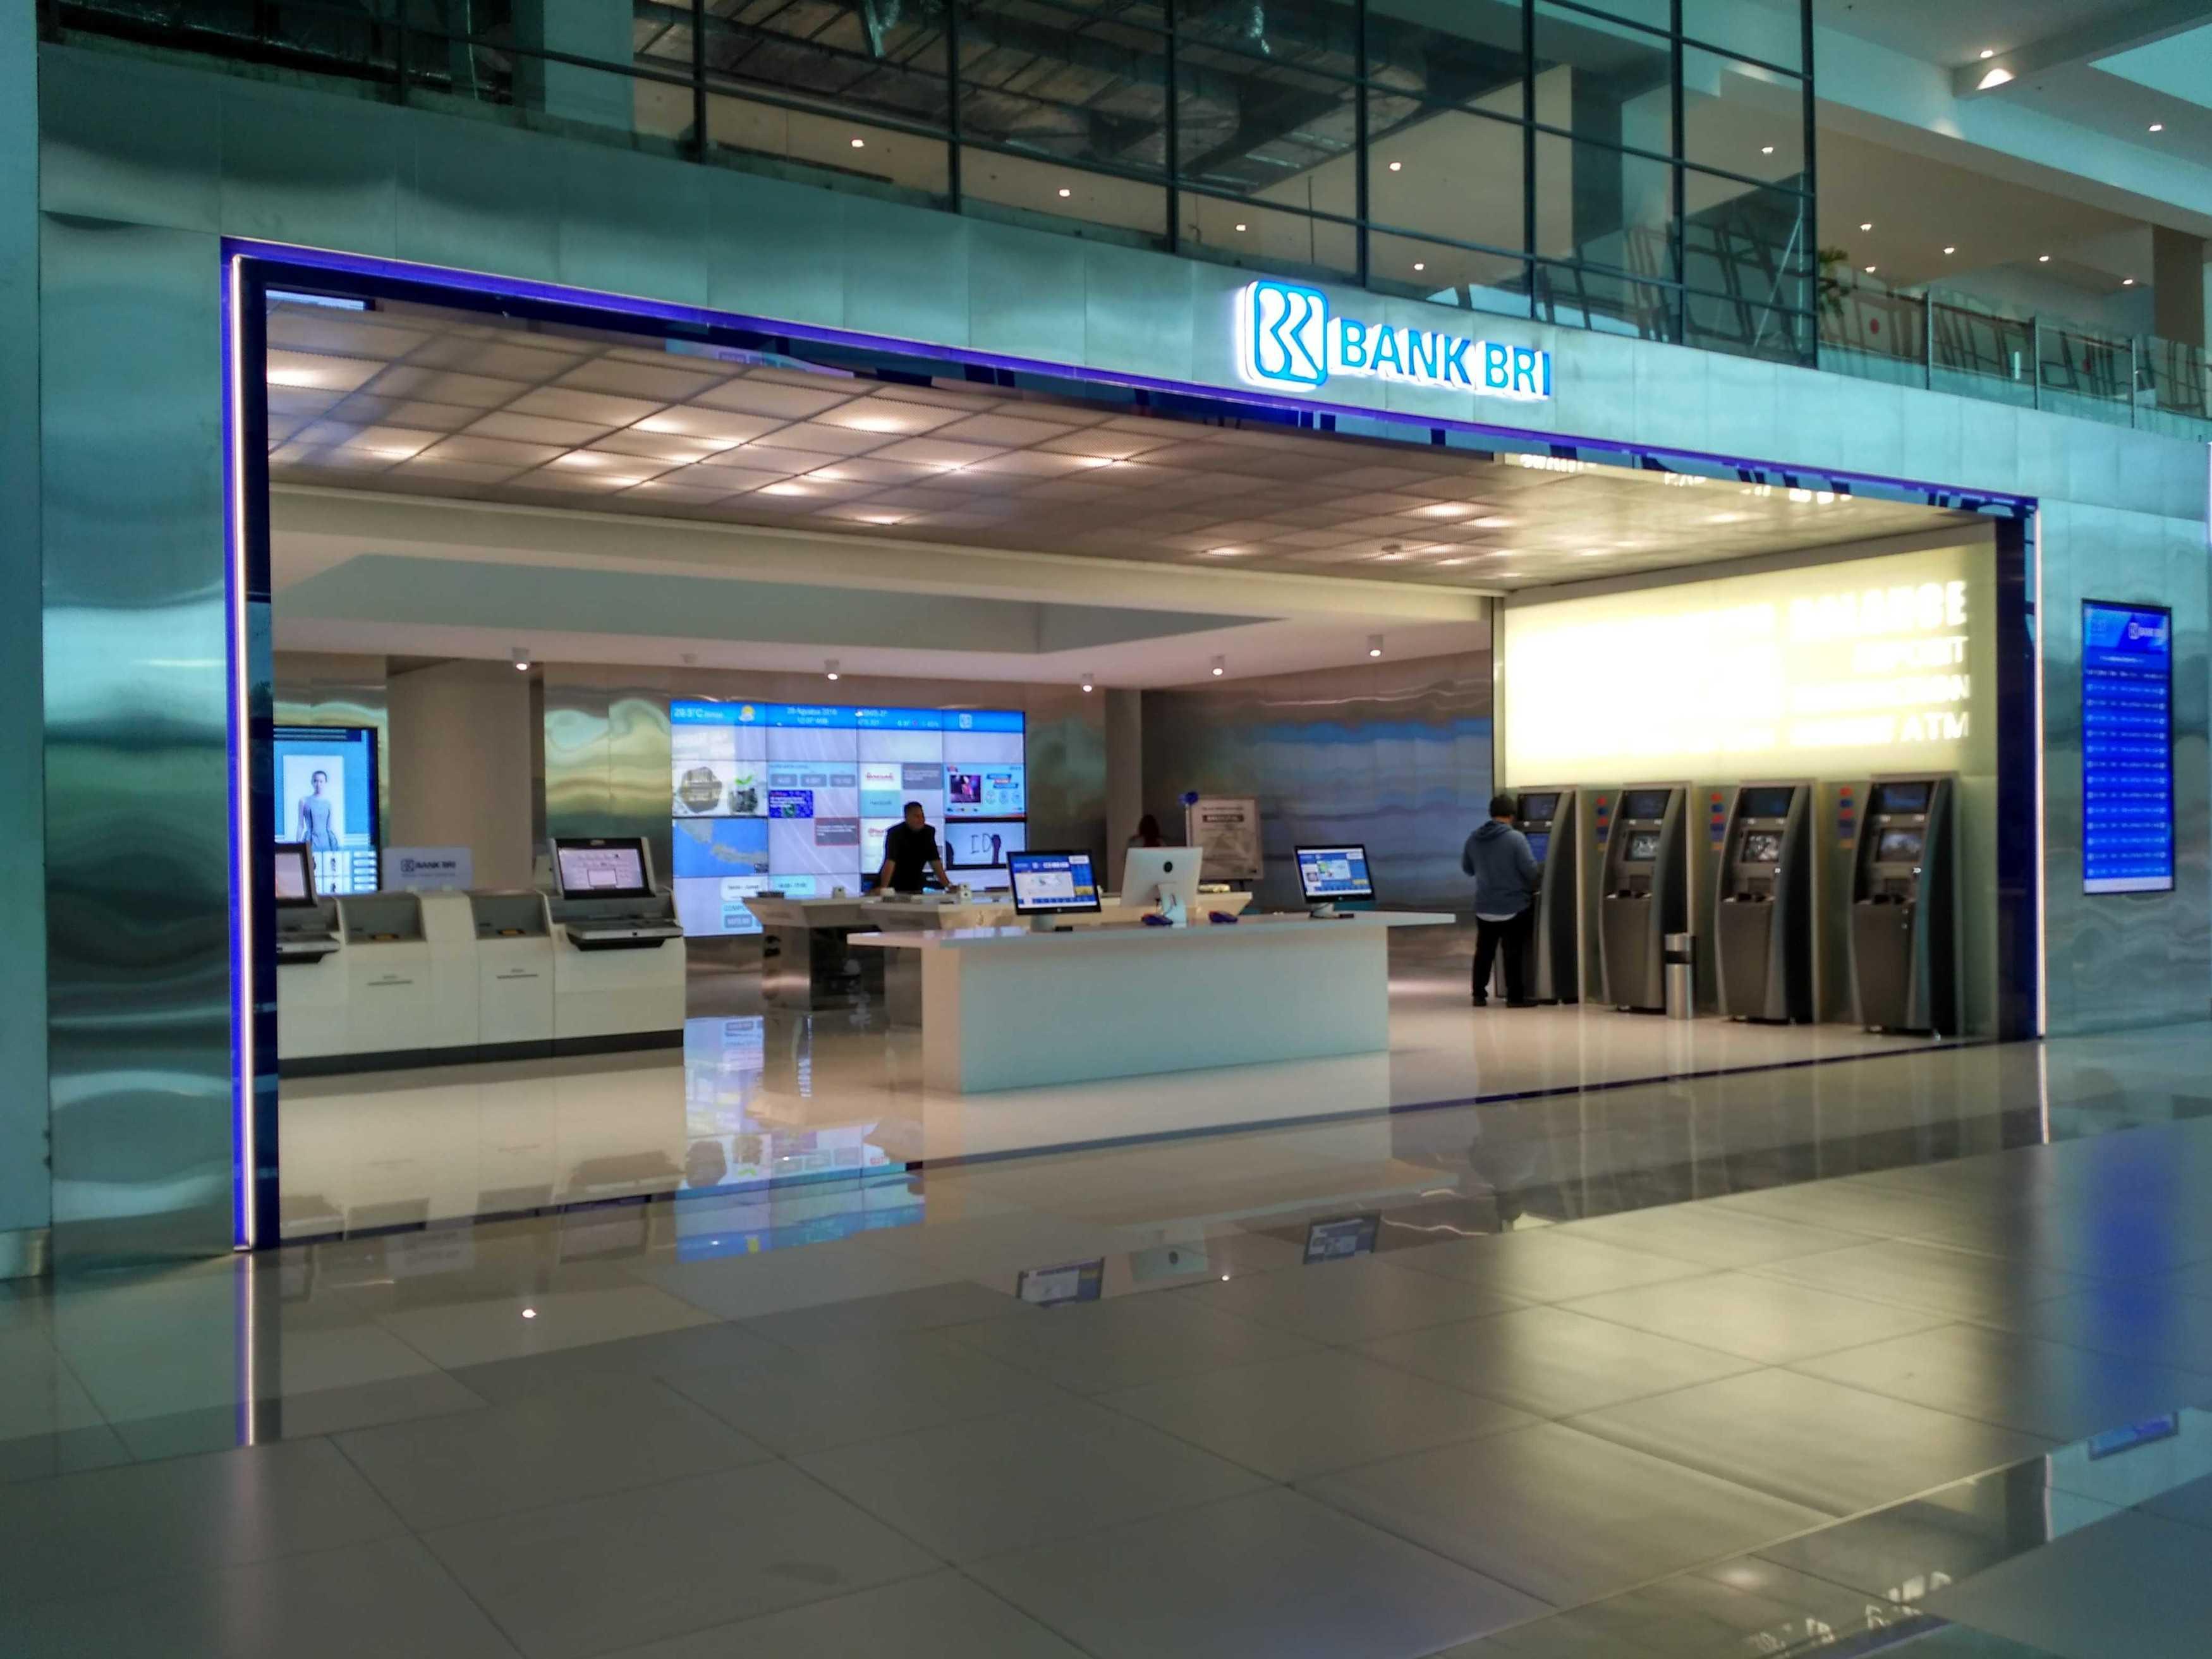 Axon90 The Design Hub Bri Digital Bank Terminal 3 Ultimate, Soekarno Hatta Bandara, Cengkareng Terminal 3 Ultimate, Soekarno Hatta Bandara, Cengkareng Front View Modern  9765